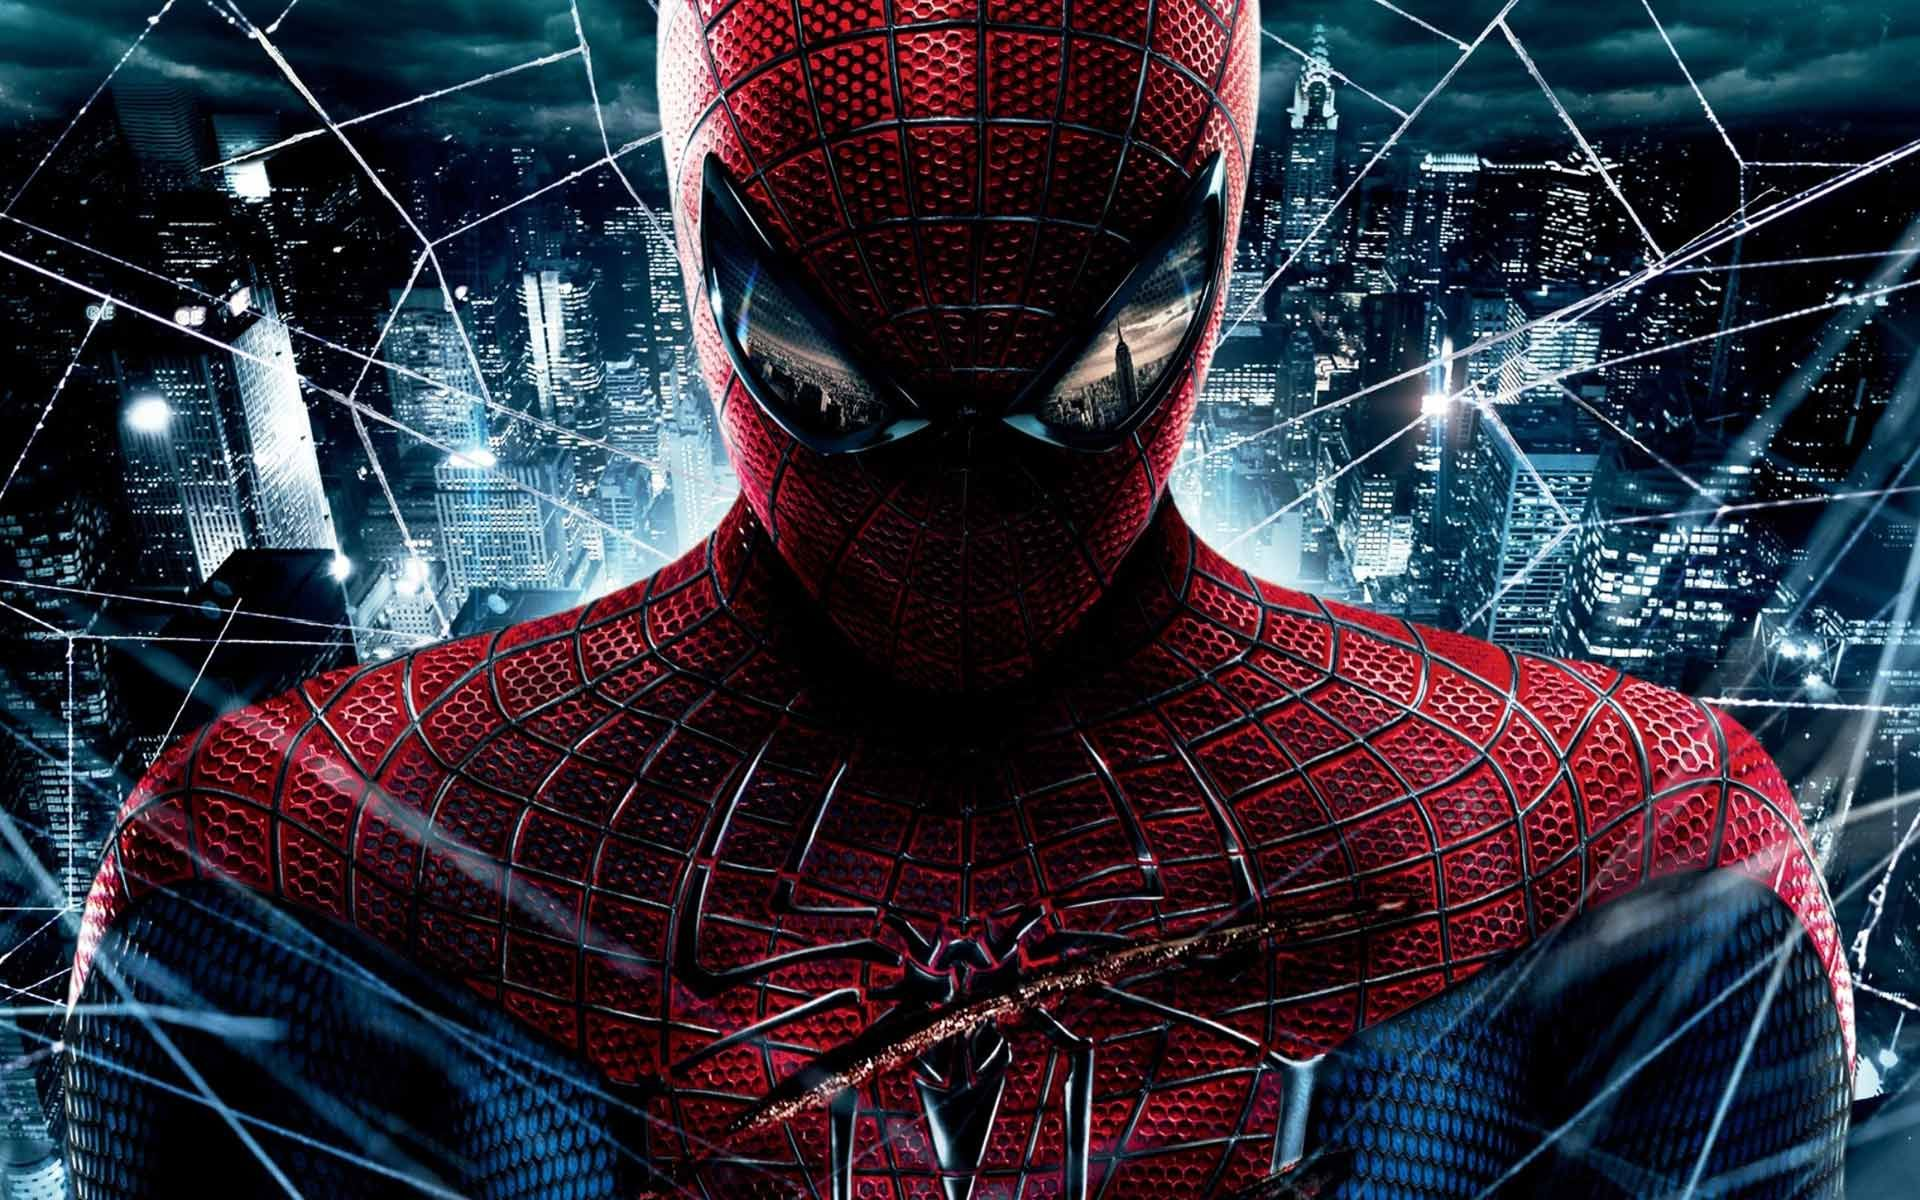 Most Inspiring Wallpaper Home Screen Spiderman - 0e07631ea7cb3feb527e71c2402b00f5  Trends_711320.jpg